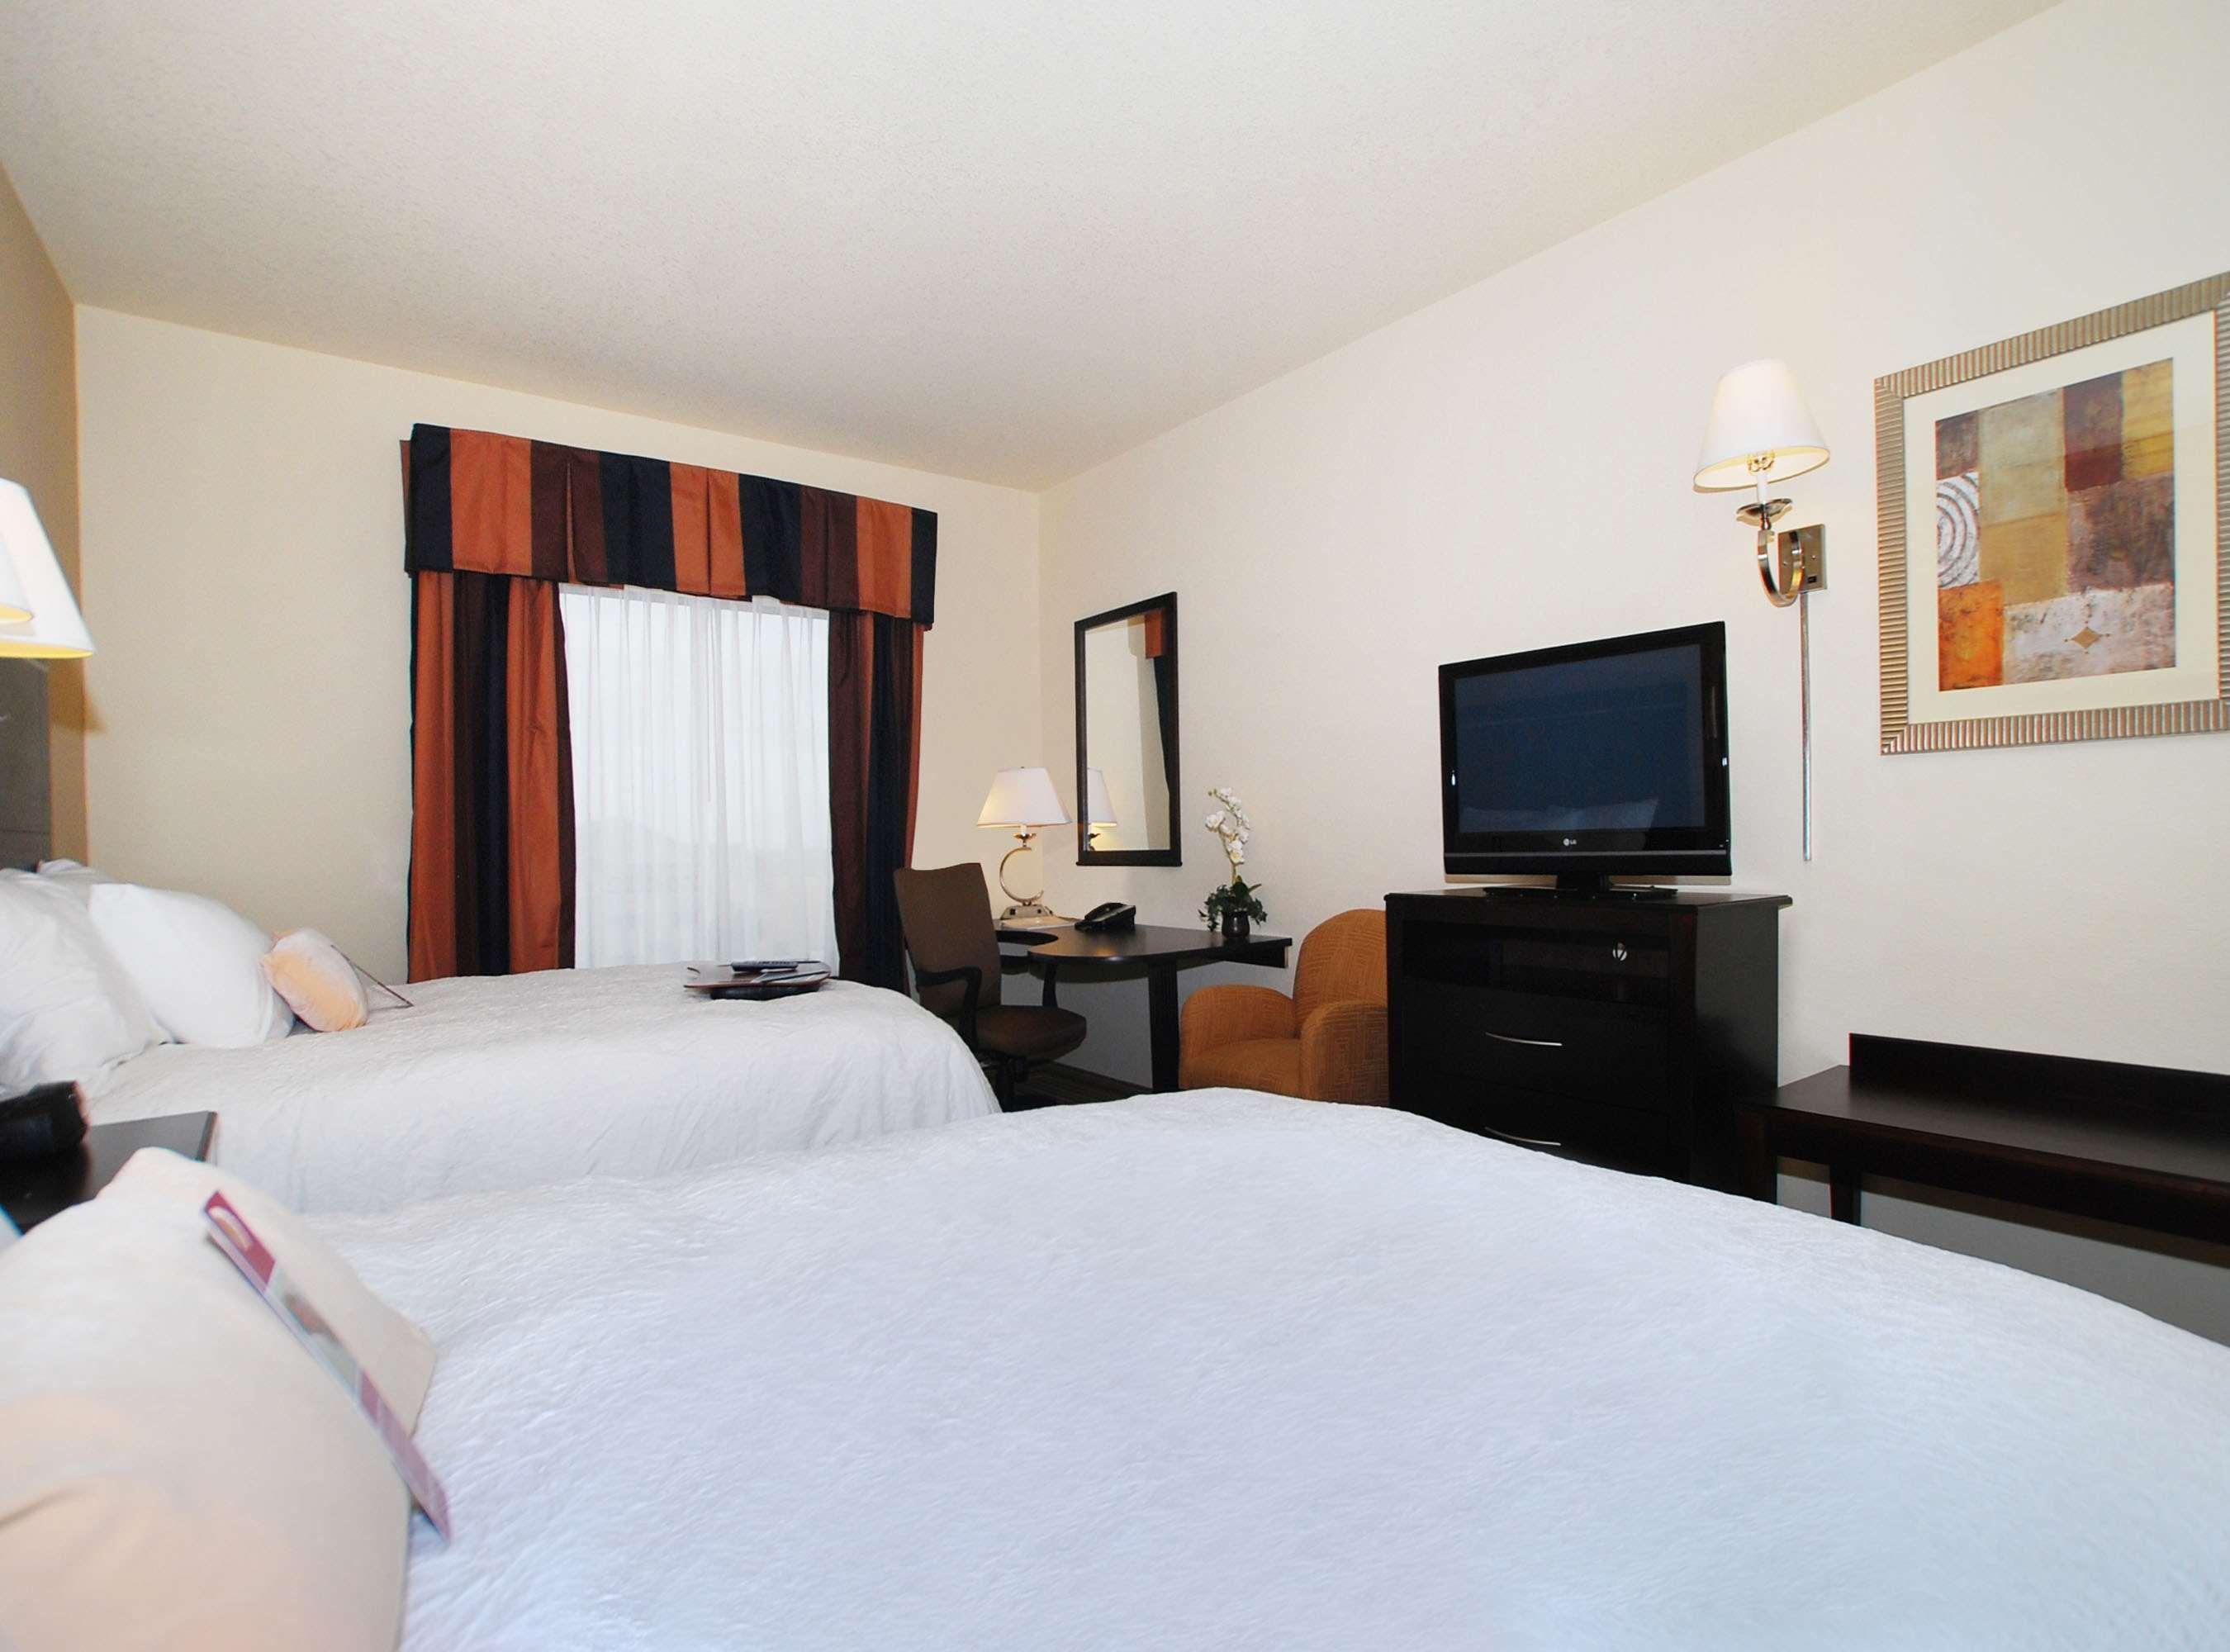 Hampton Inn & Suites Childress image 14